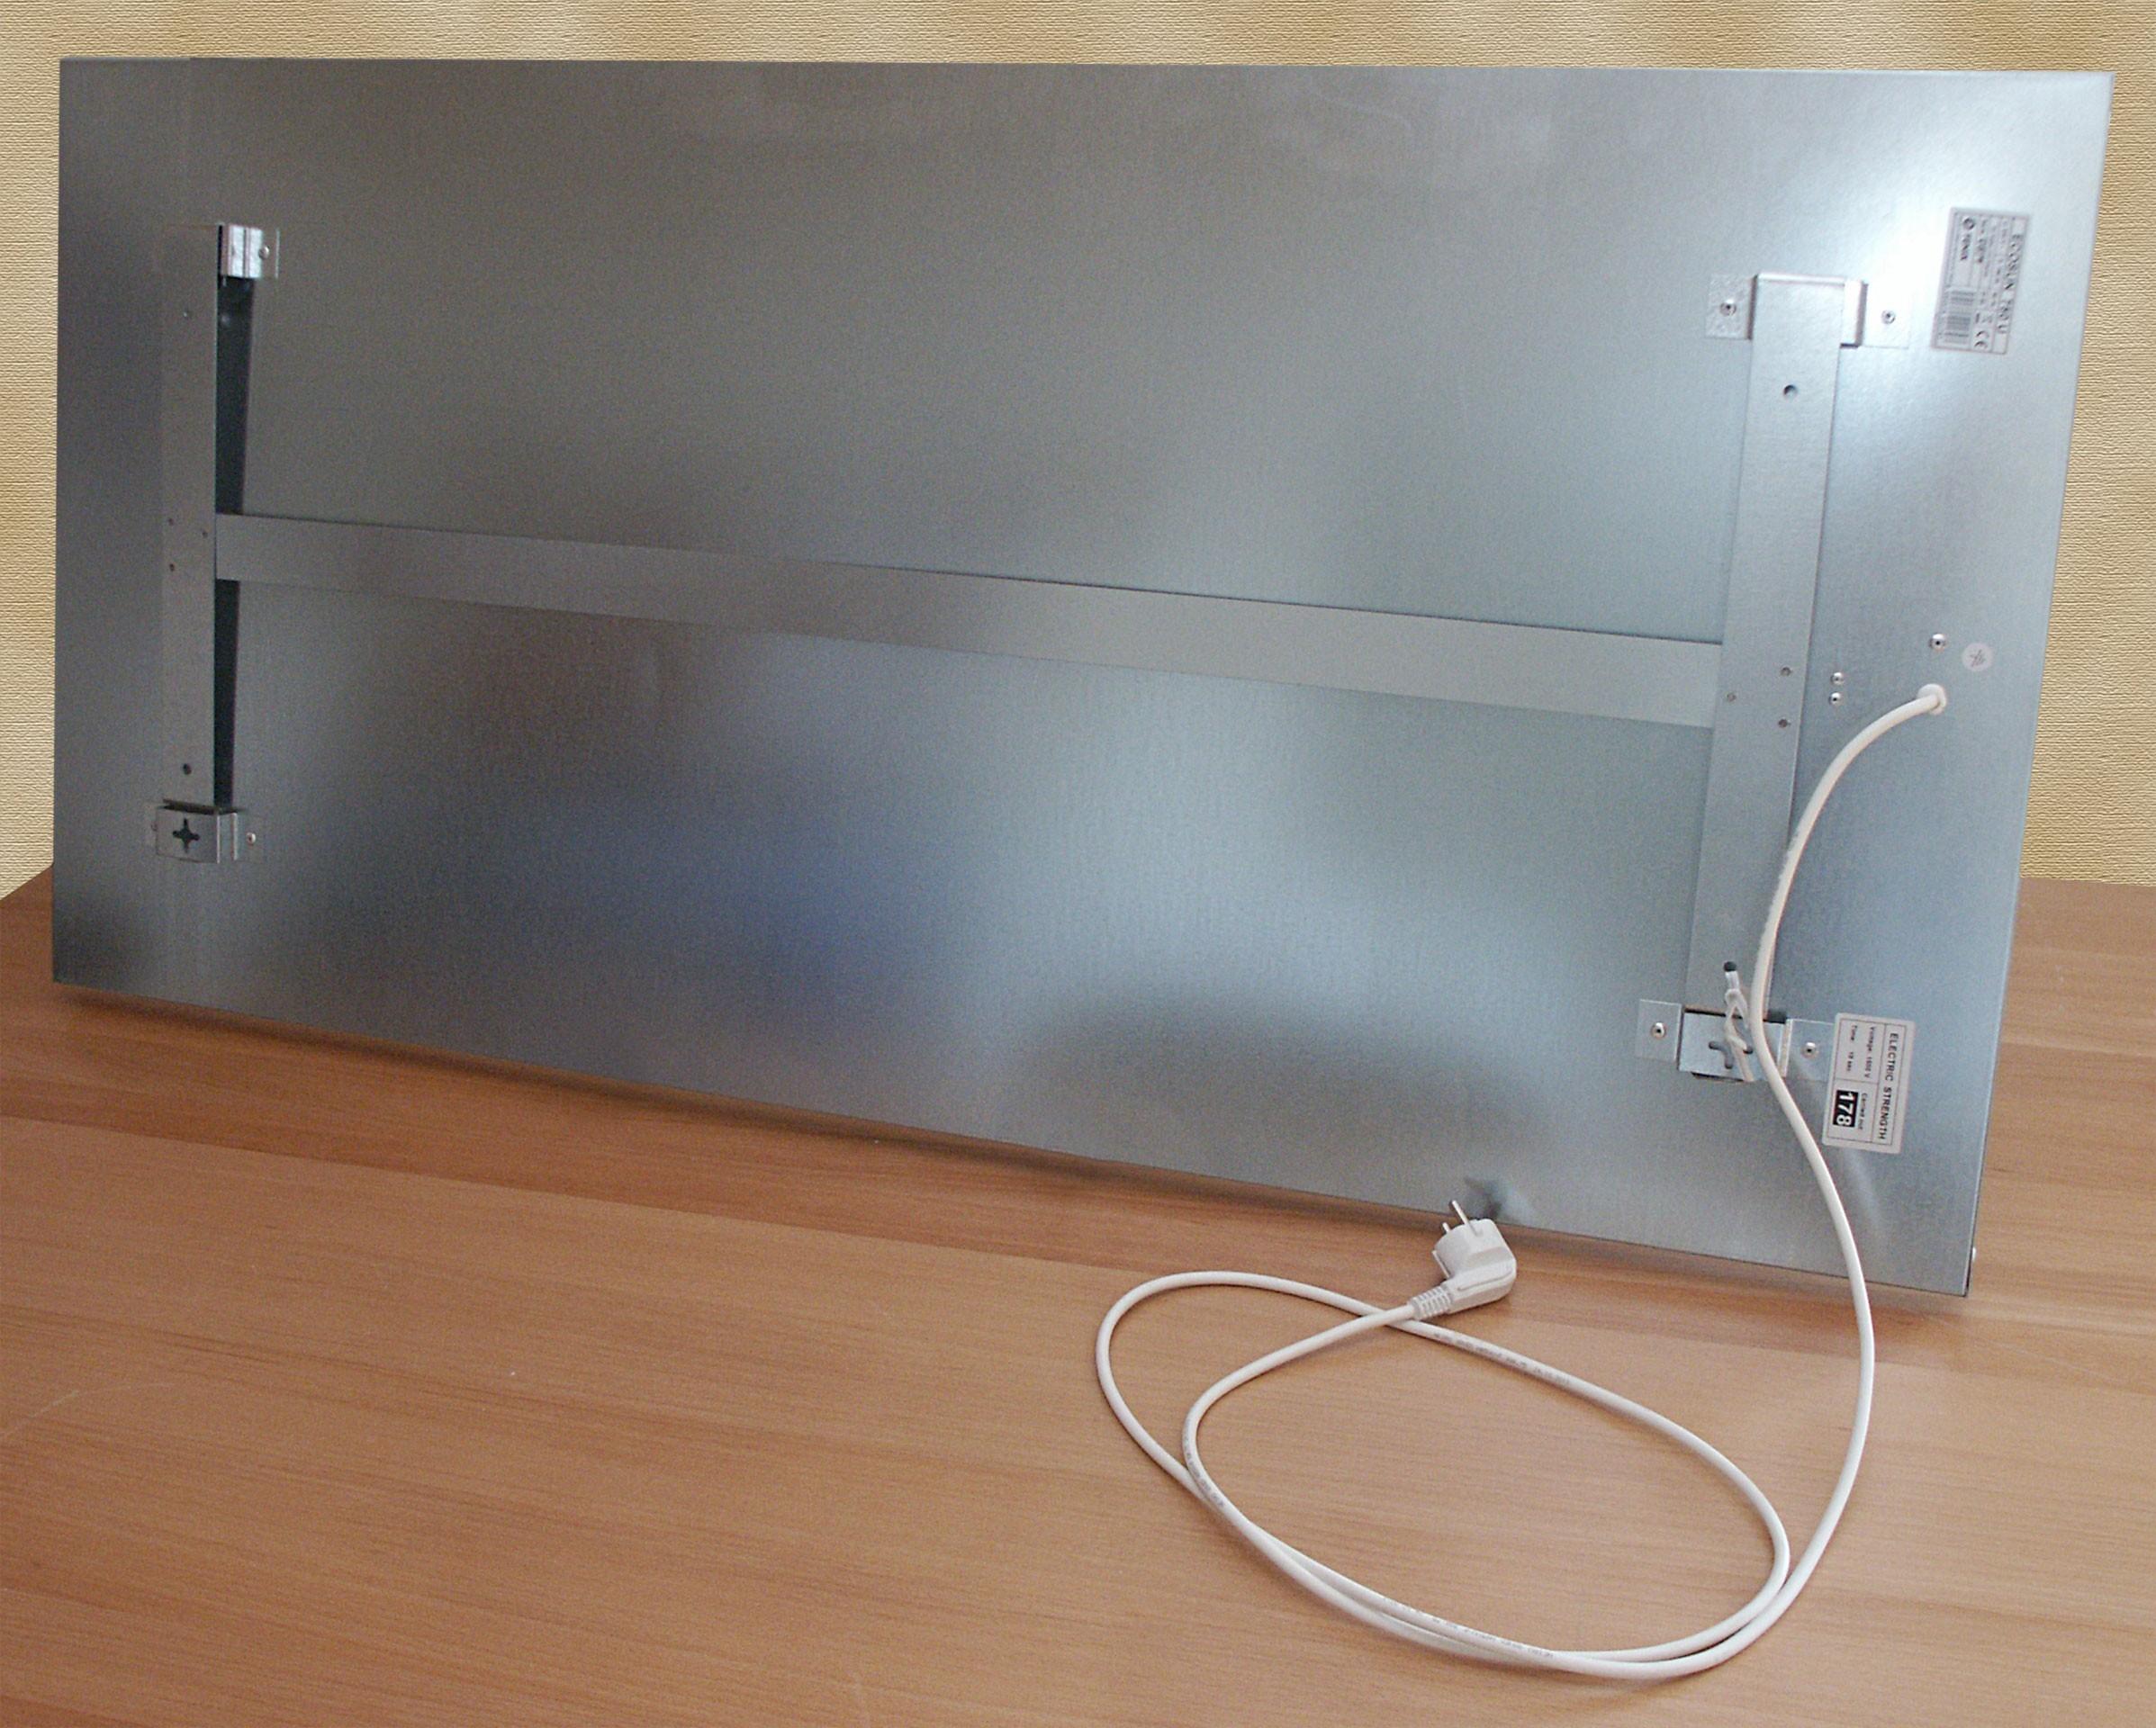 infrarotheizung fenix wei 119x59x3cm 750 watt bei. Black Bedroom Furniture Sets. Home Design Ideas